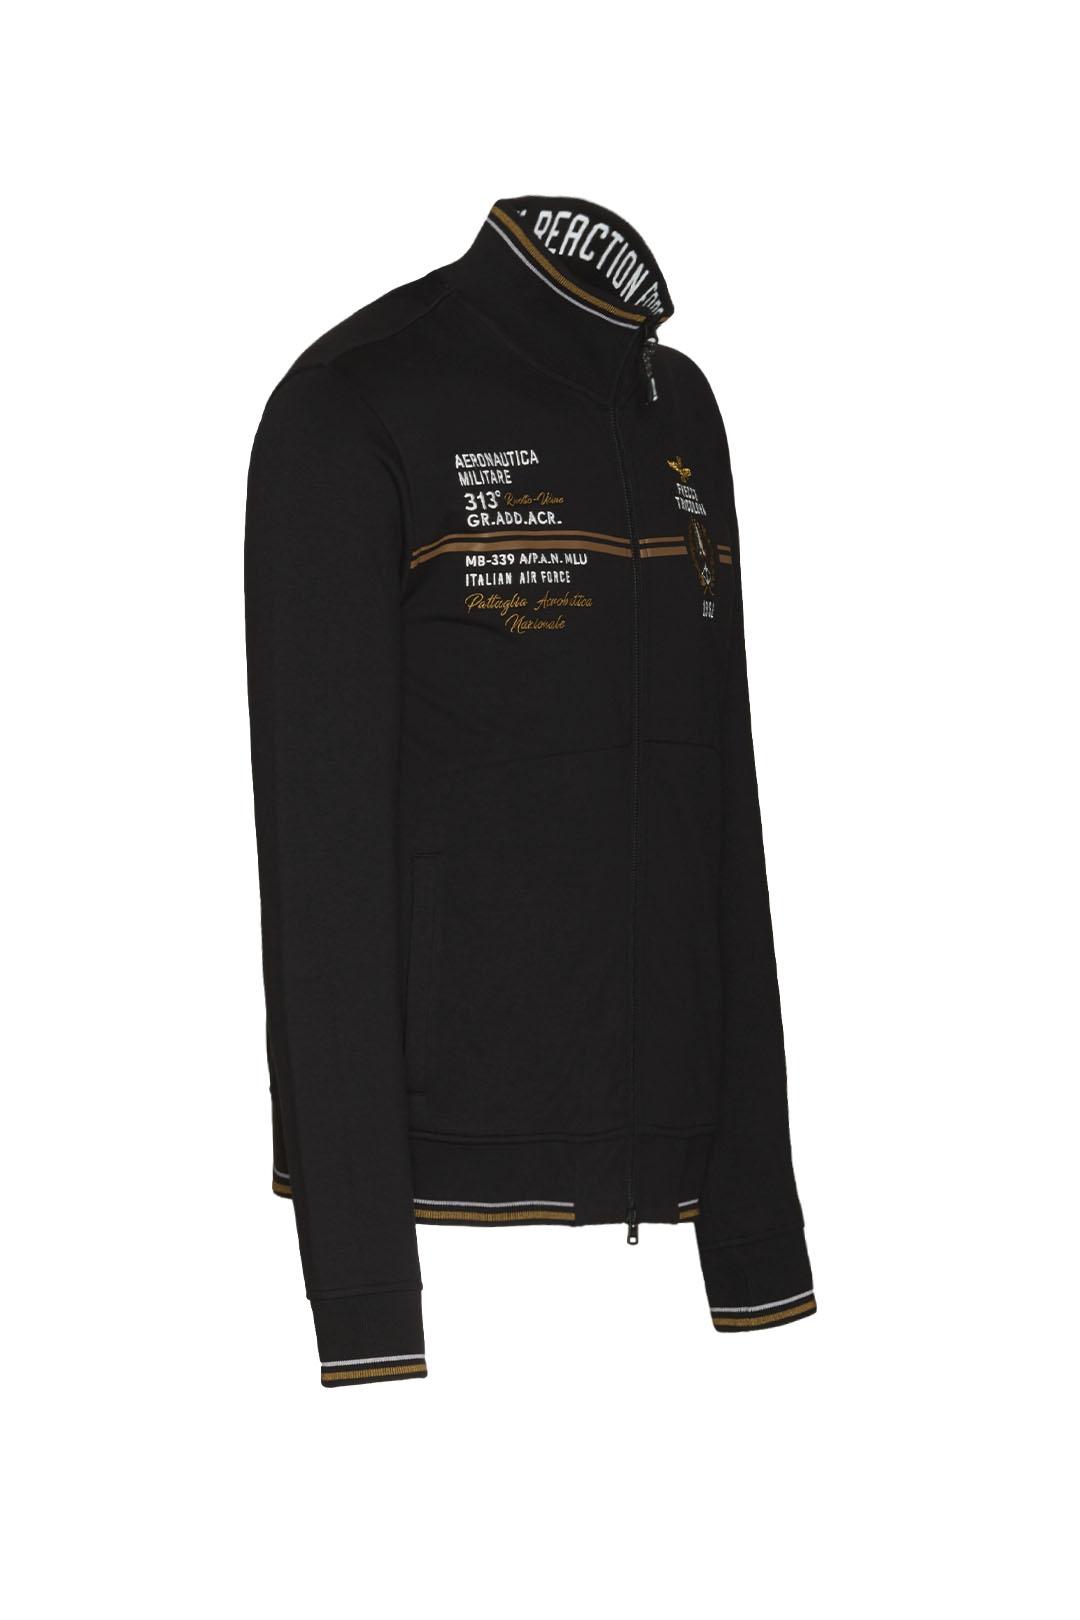 Frecce Tricolori Baumwolle-Sweatshirt    3